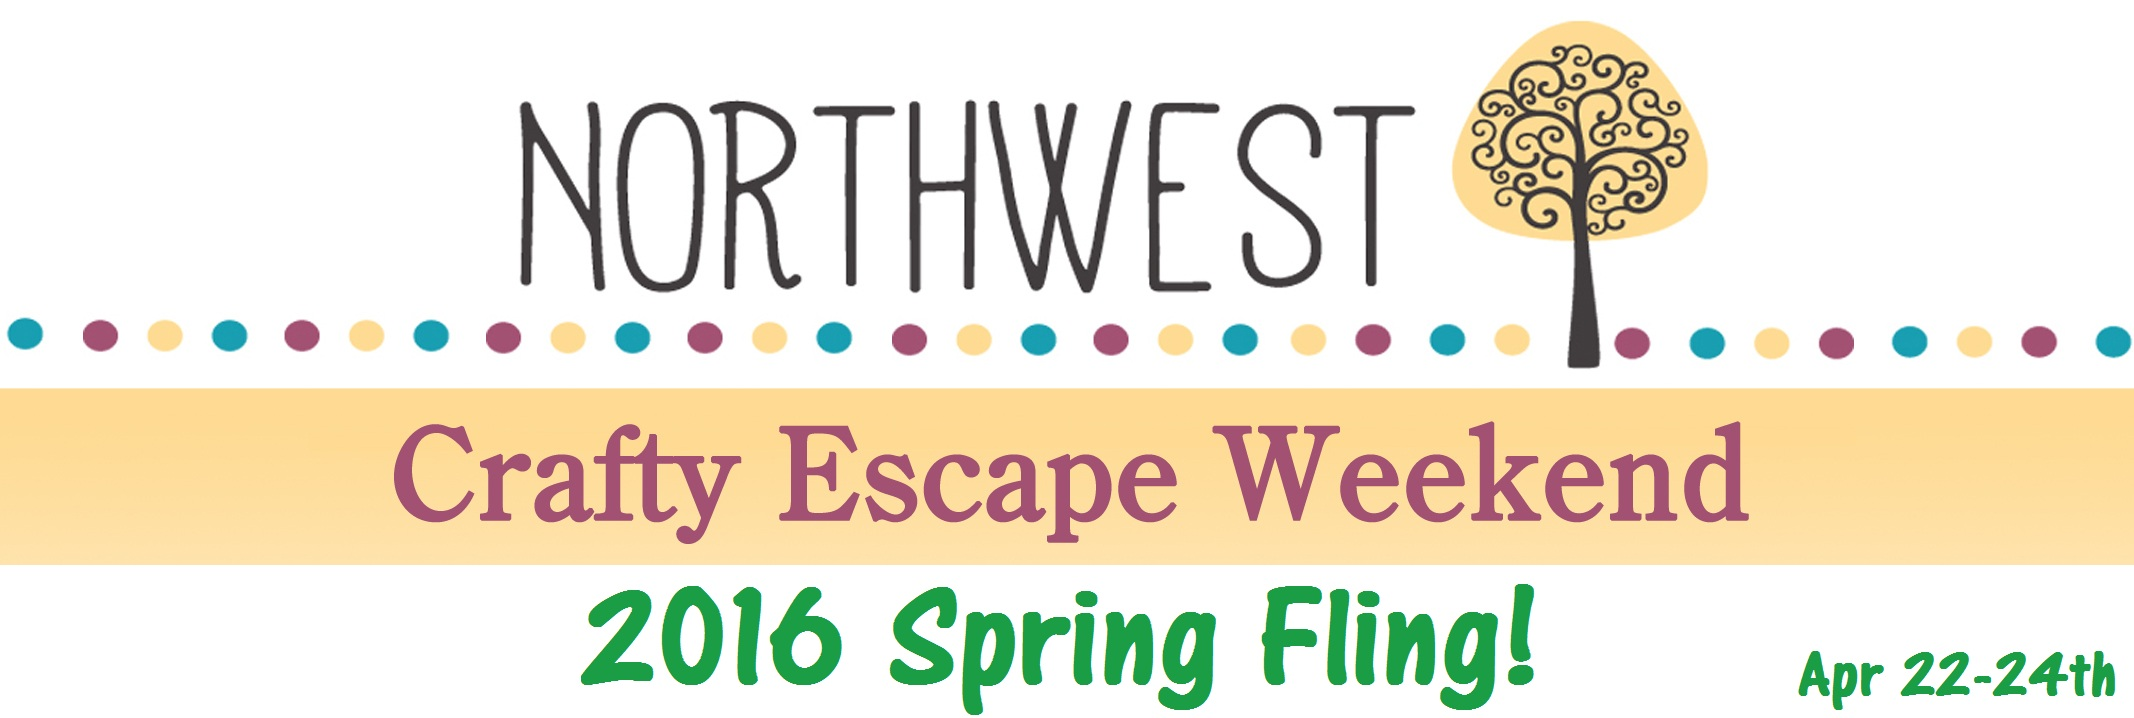 NW Crafty Escape Weekend spring 2016